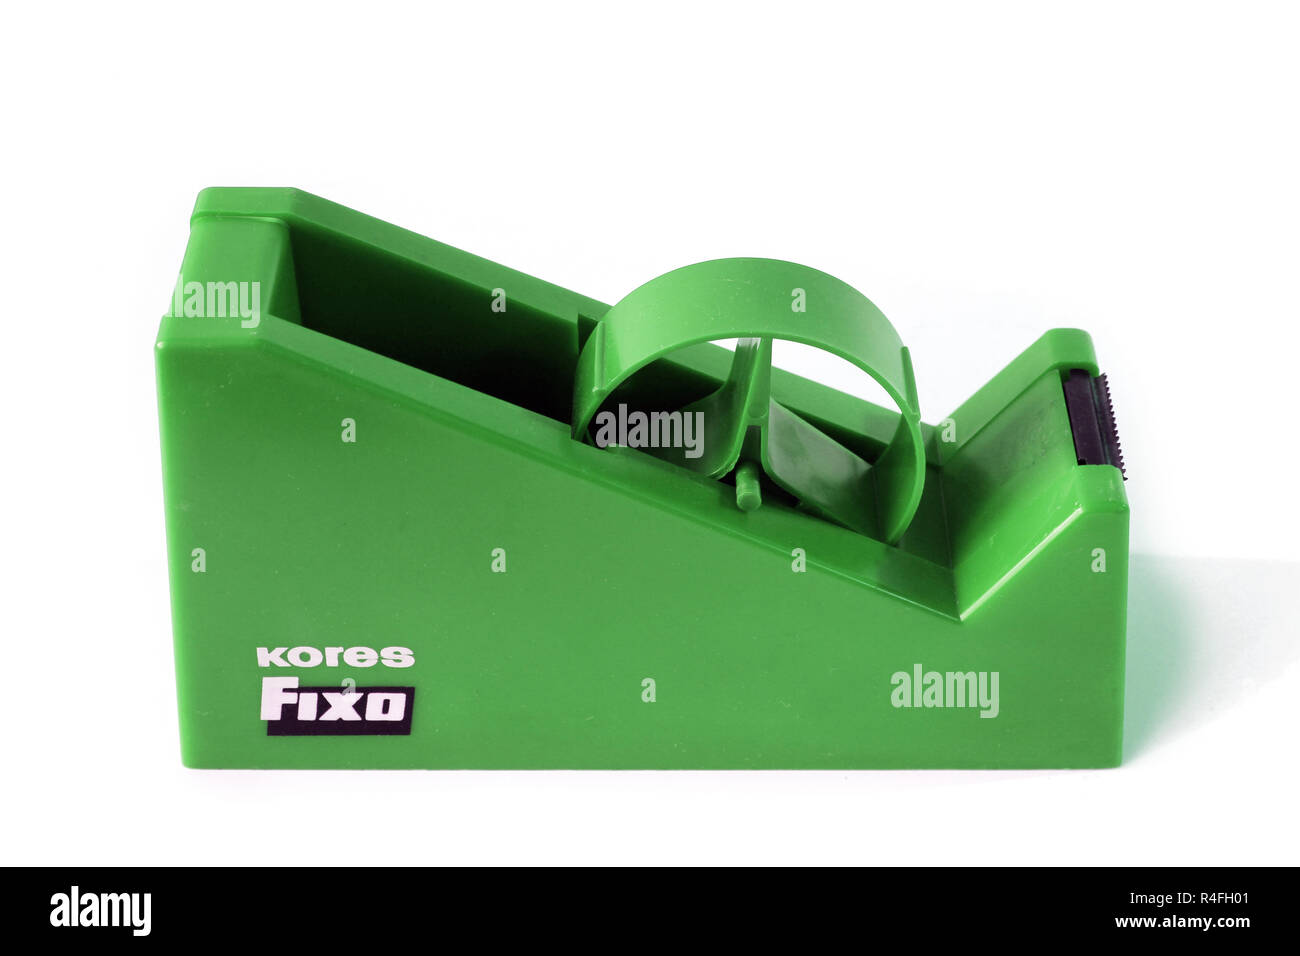 Scotch Tape Stock Photos & Scotch Tape Stock Images - Alamy